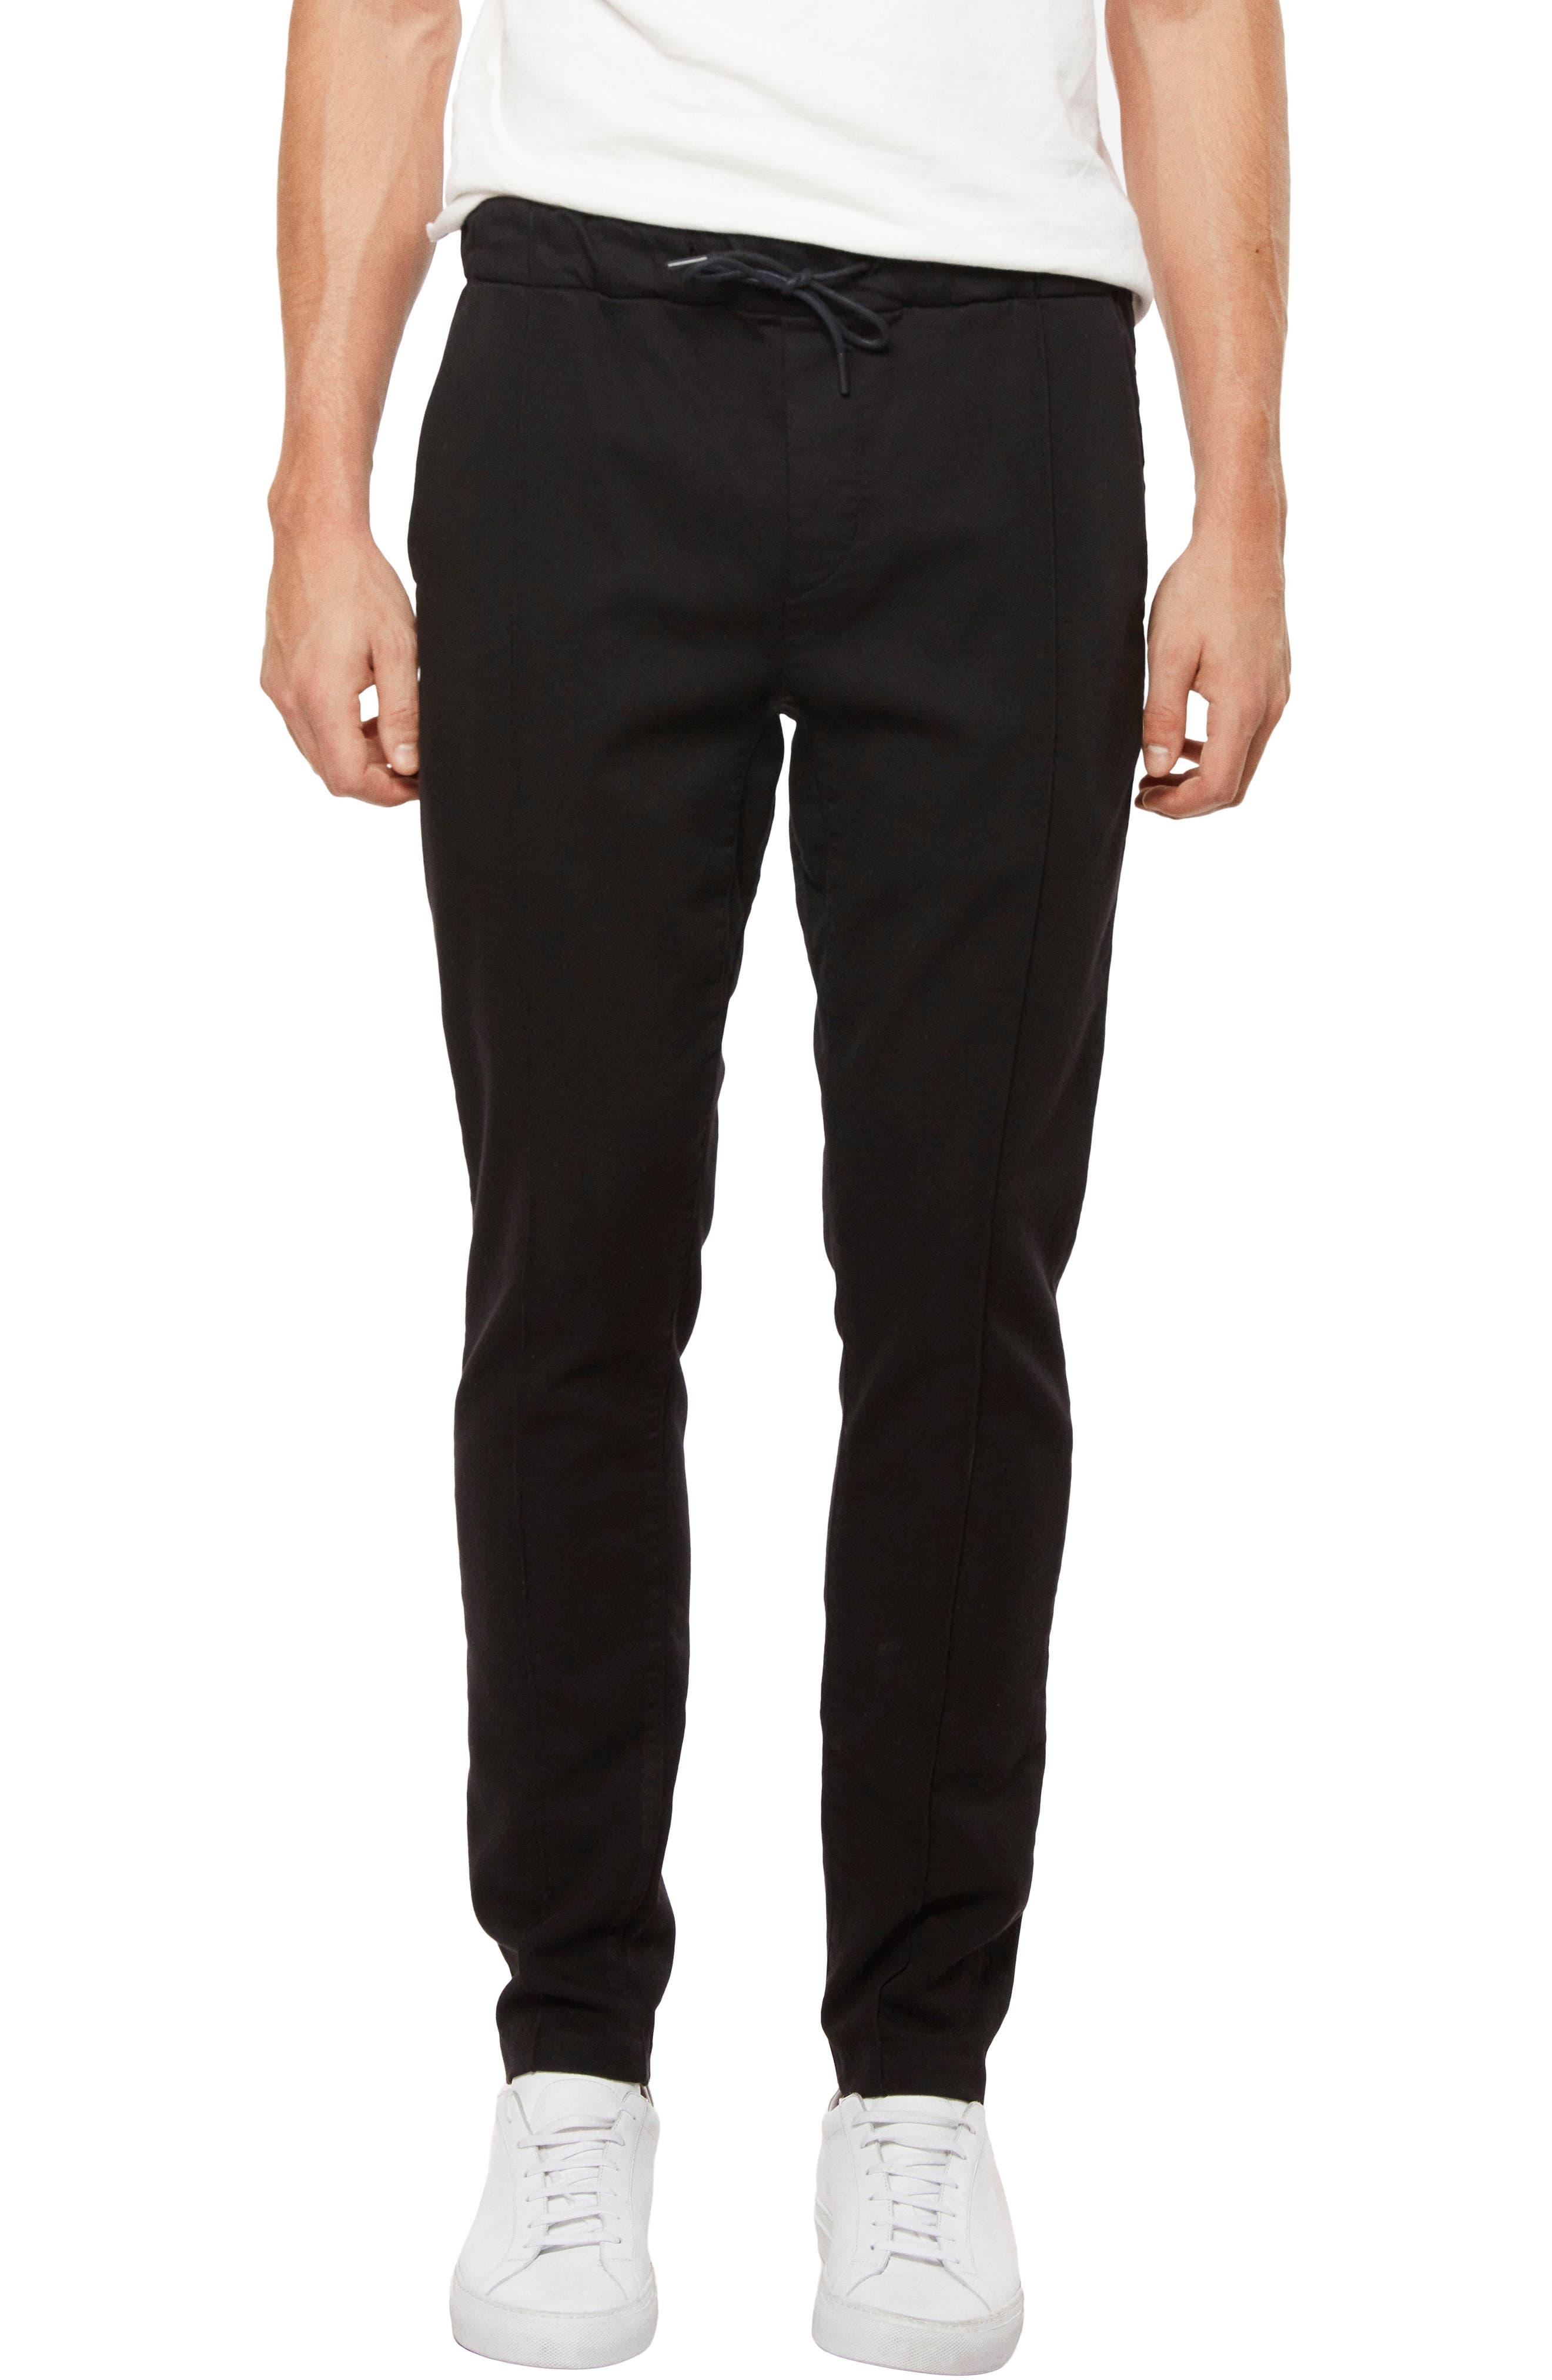 Wakat Relaxed Fit Jogger Pants,                             Main thumbnail 1, color,                             Black